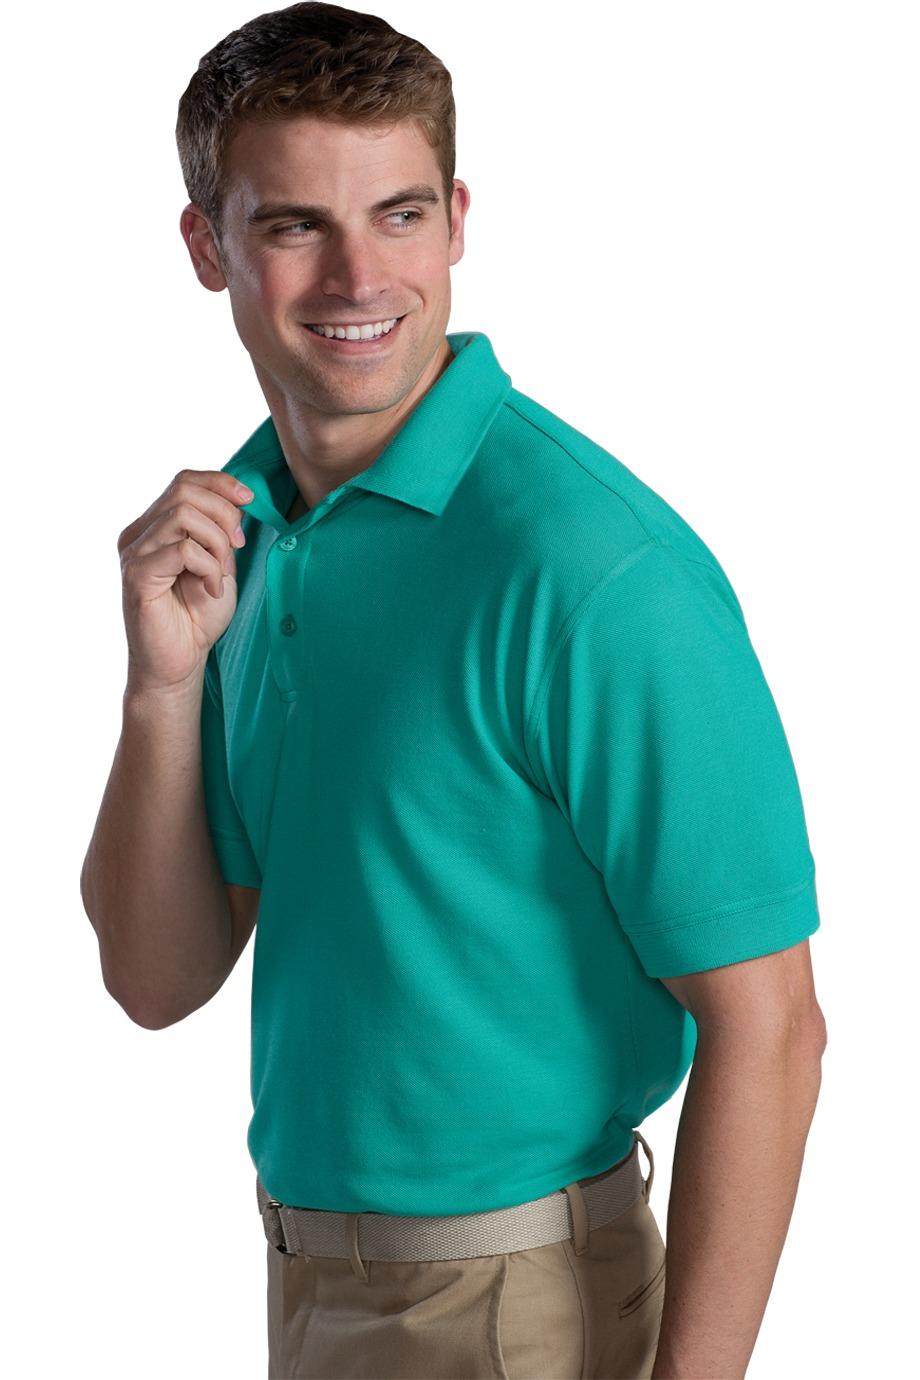 Edwards Garment 1500 - Men's Short Sleeve Soft Touch Blended Pique Polo